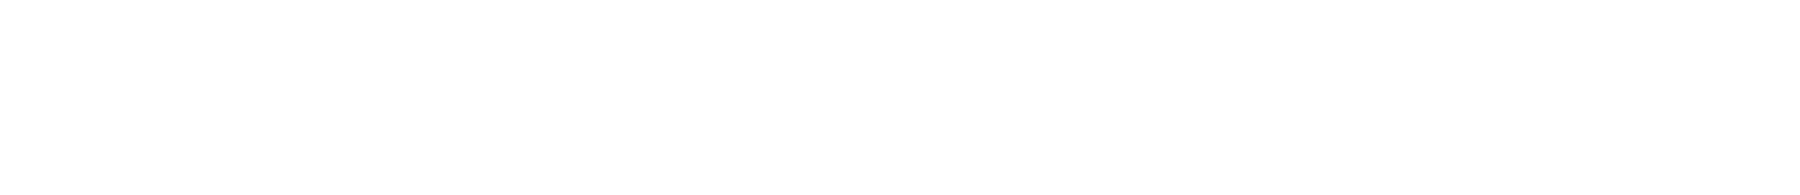 Workometry-Logo-4-Org-view.png